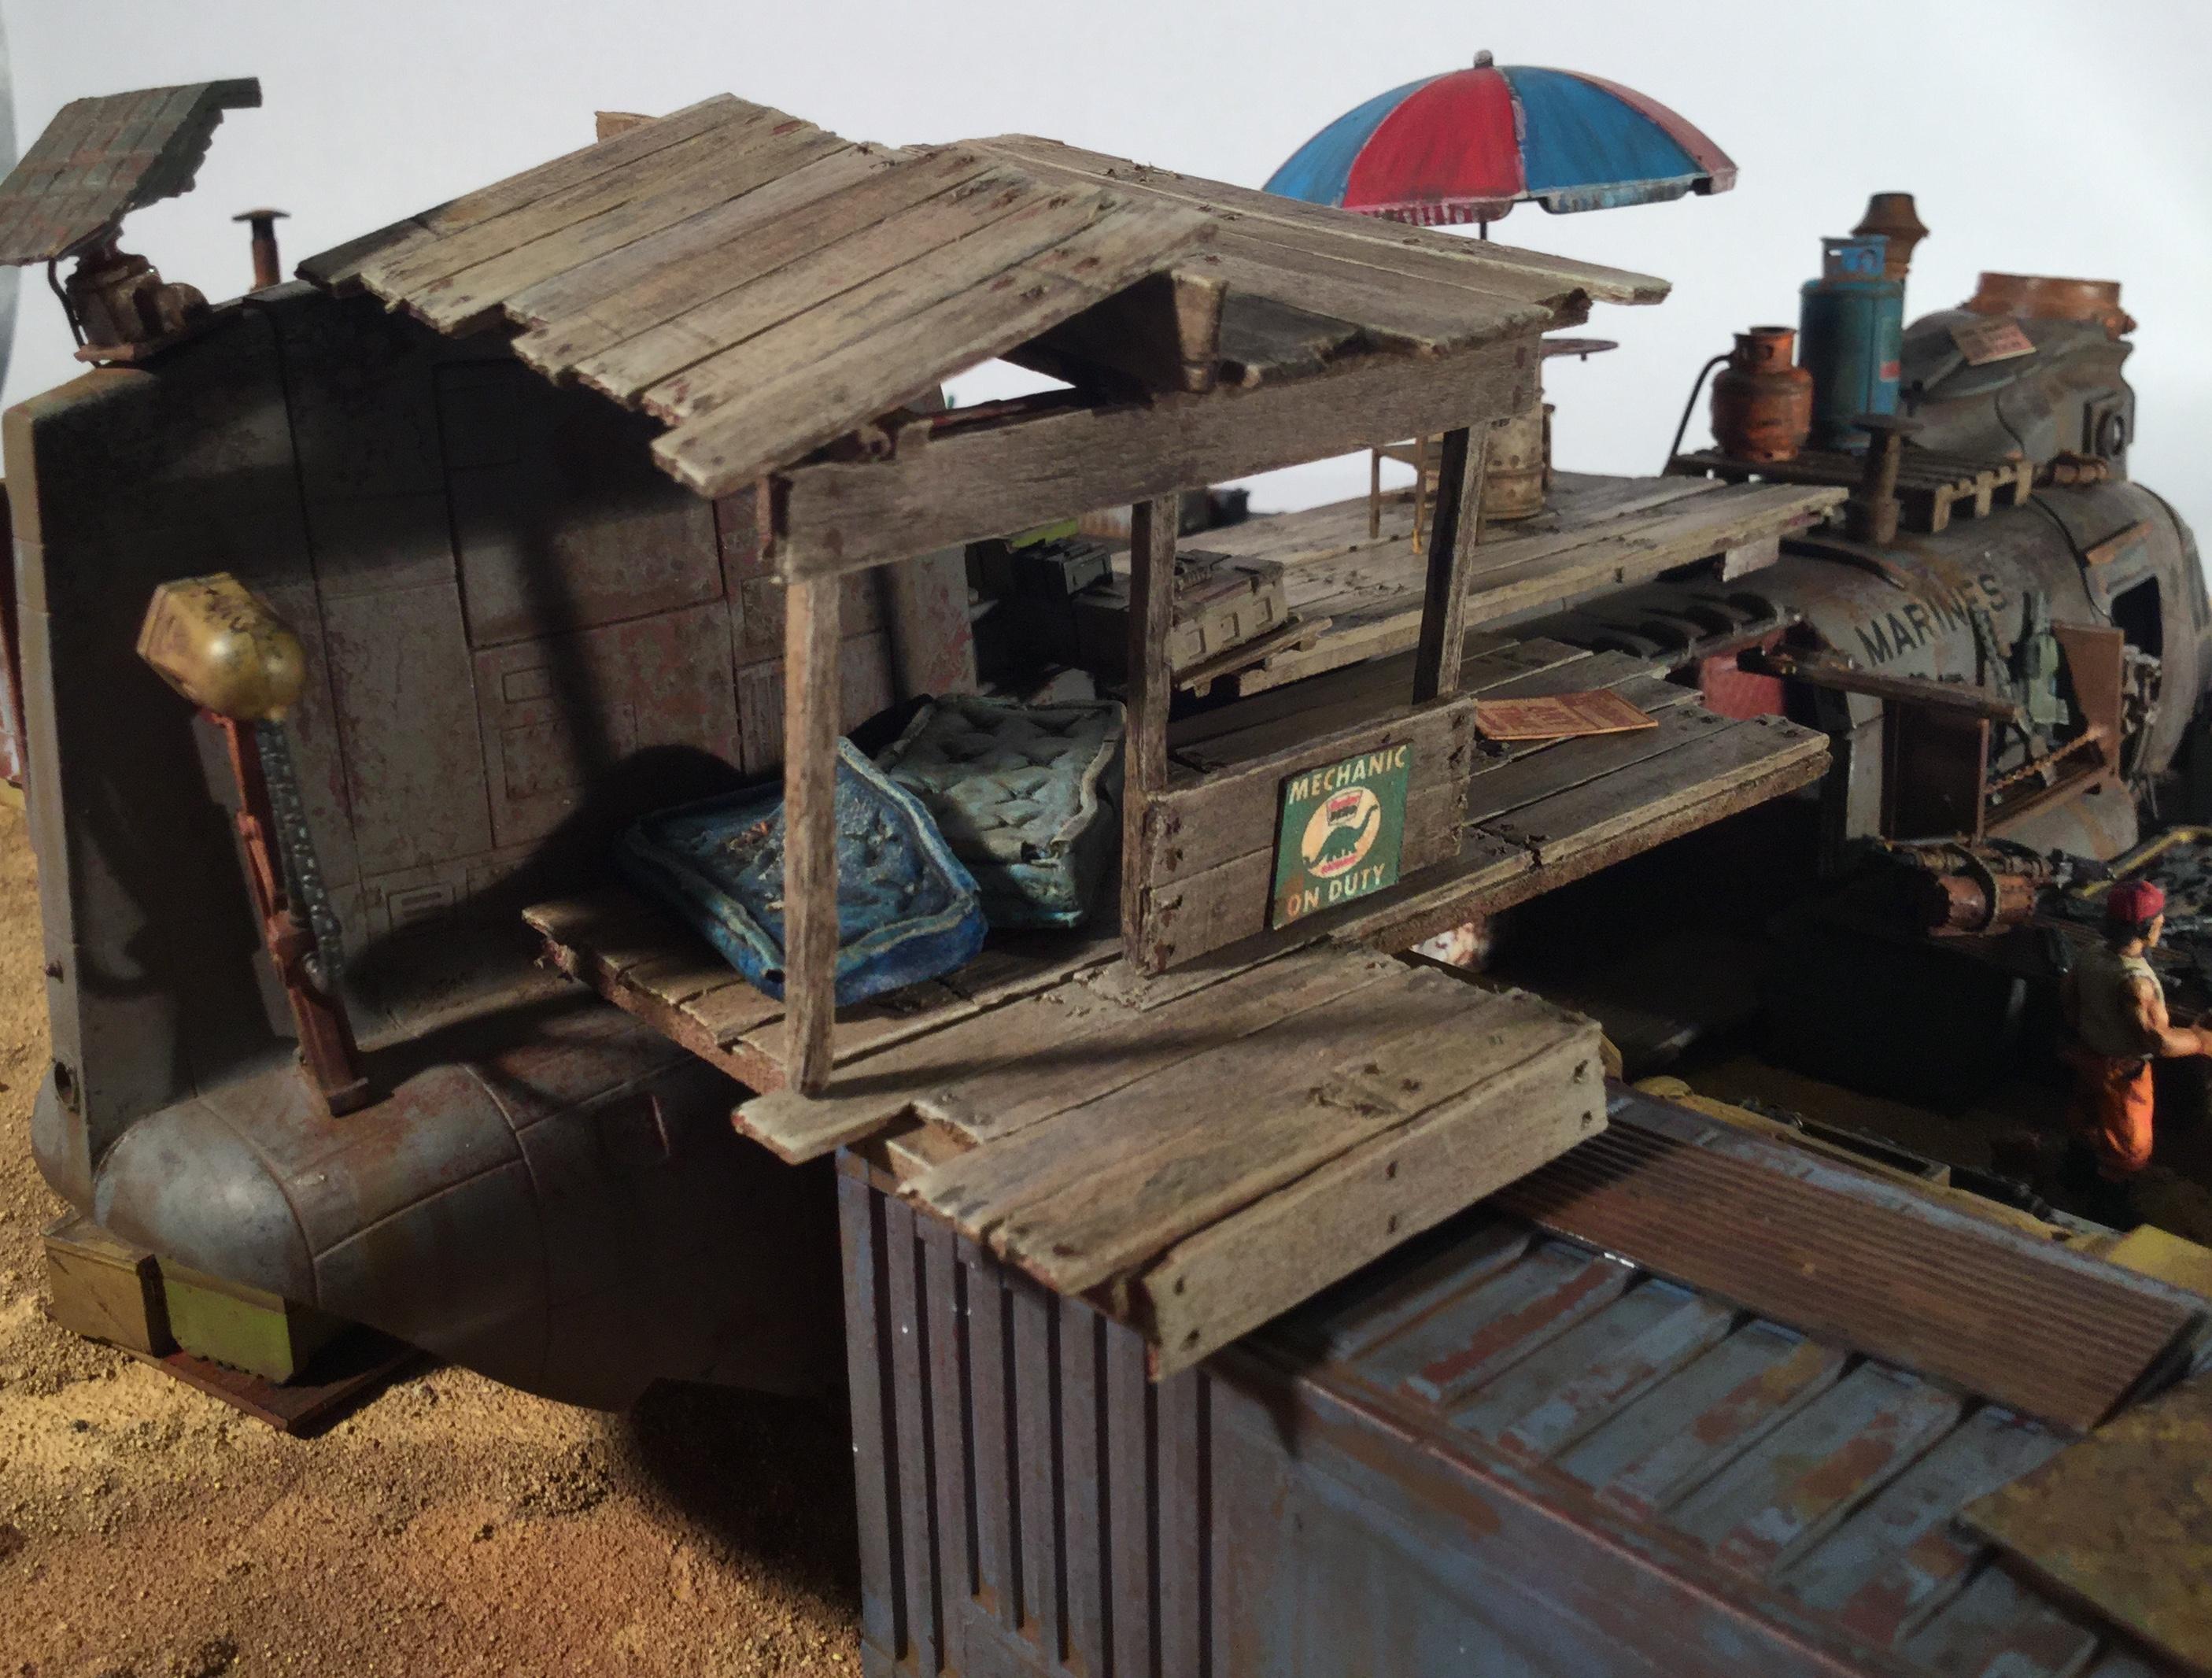 Post-apocalyptic, Salvage Yard, Terrain